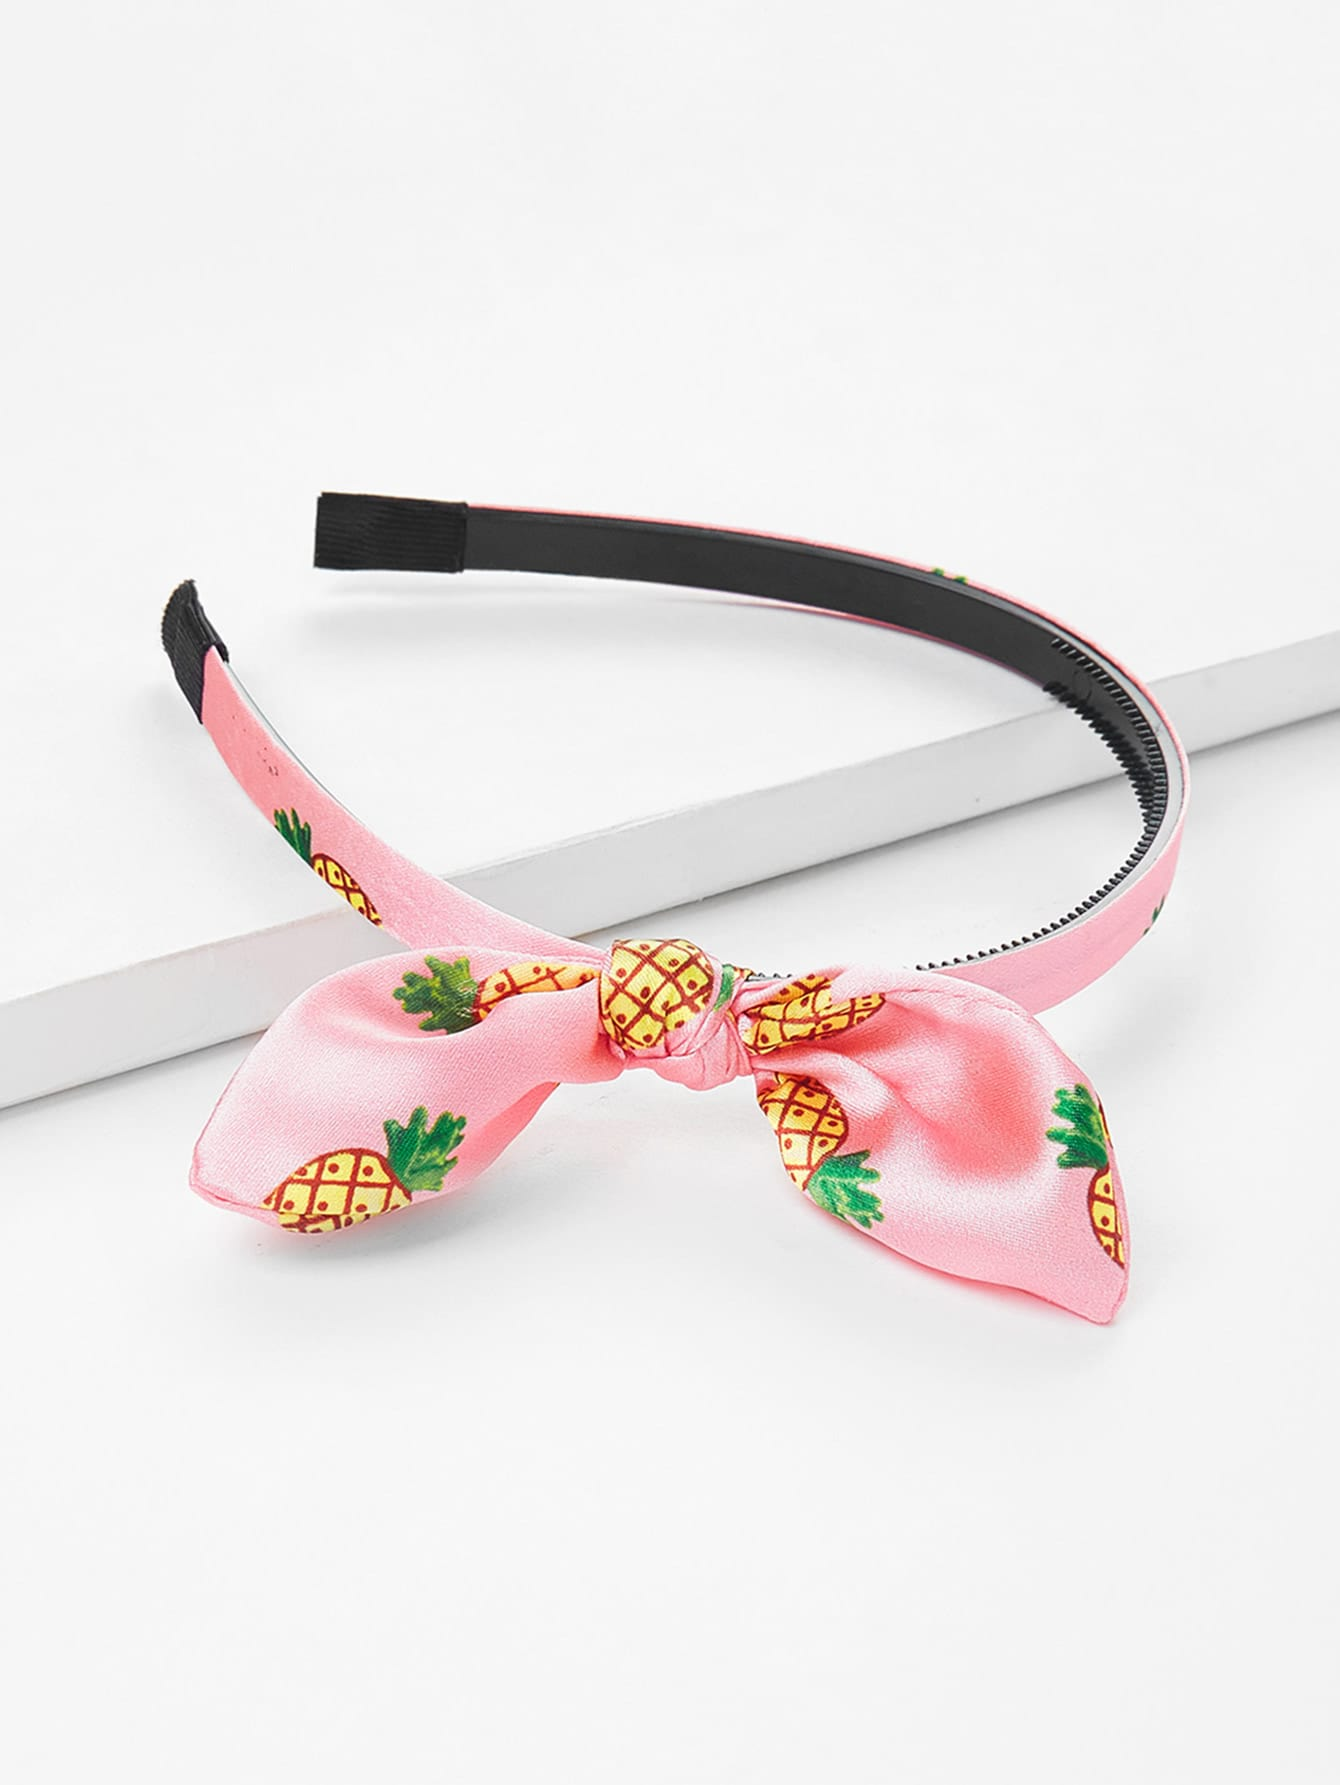 Ear Knot Headband 1pc kawaii cute lovely girls stretch ear turban knot hairband rabbit bow headband hair band accessories